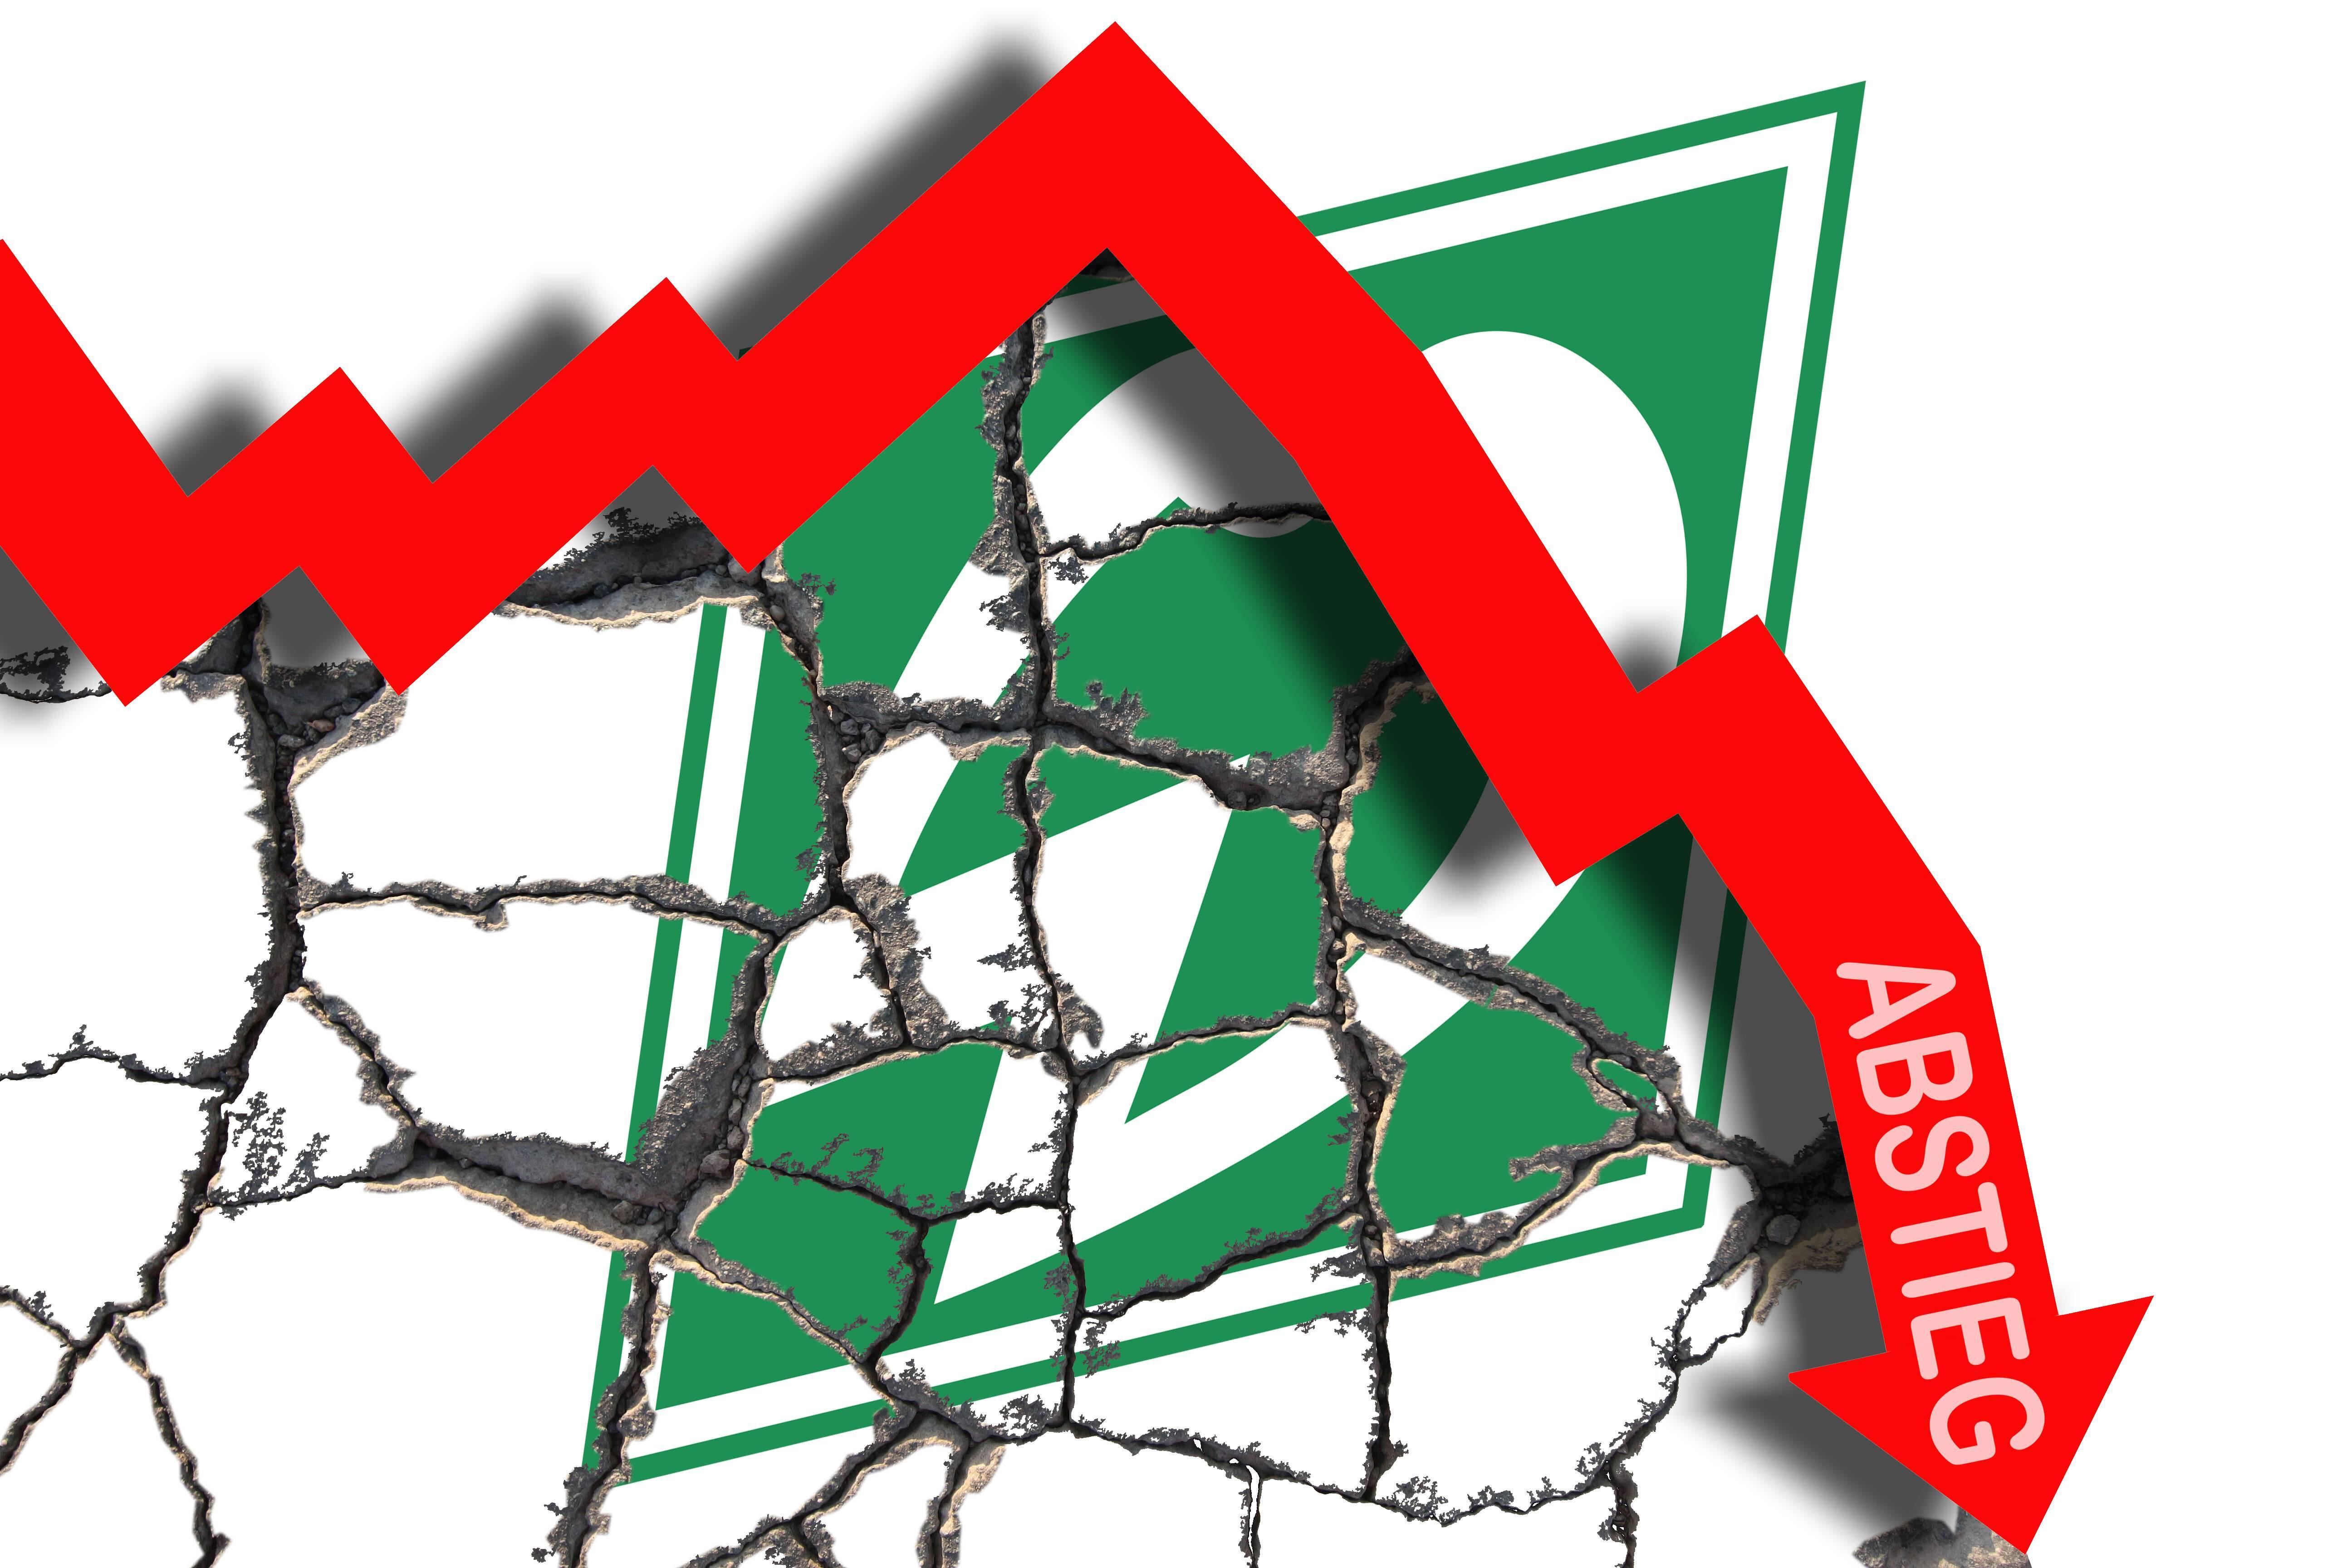 Bild zu Werder Bremen, Krise, Bundesliga, Abstiegskampf, Viktor Skripnik